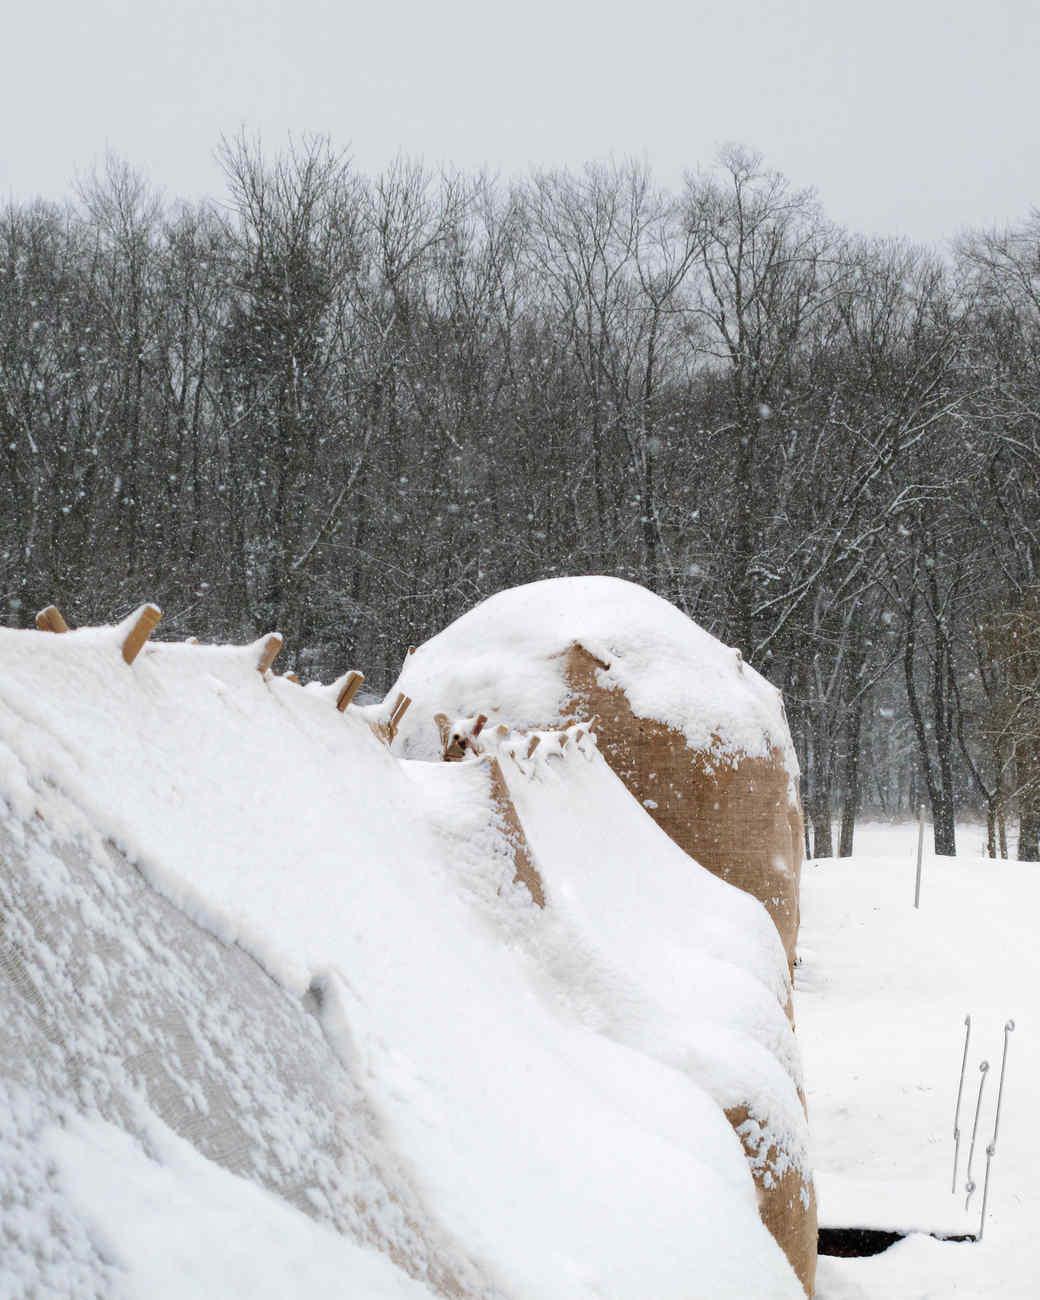 winterizing-the-garden-8-ma105573.jpg